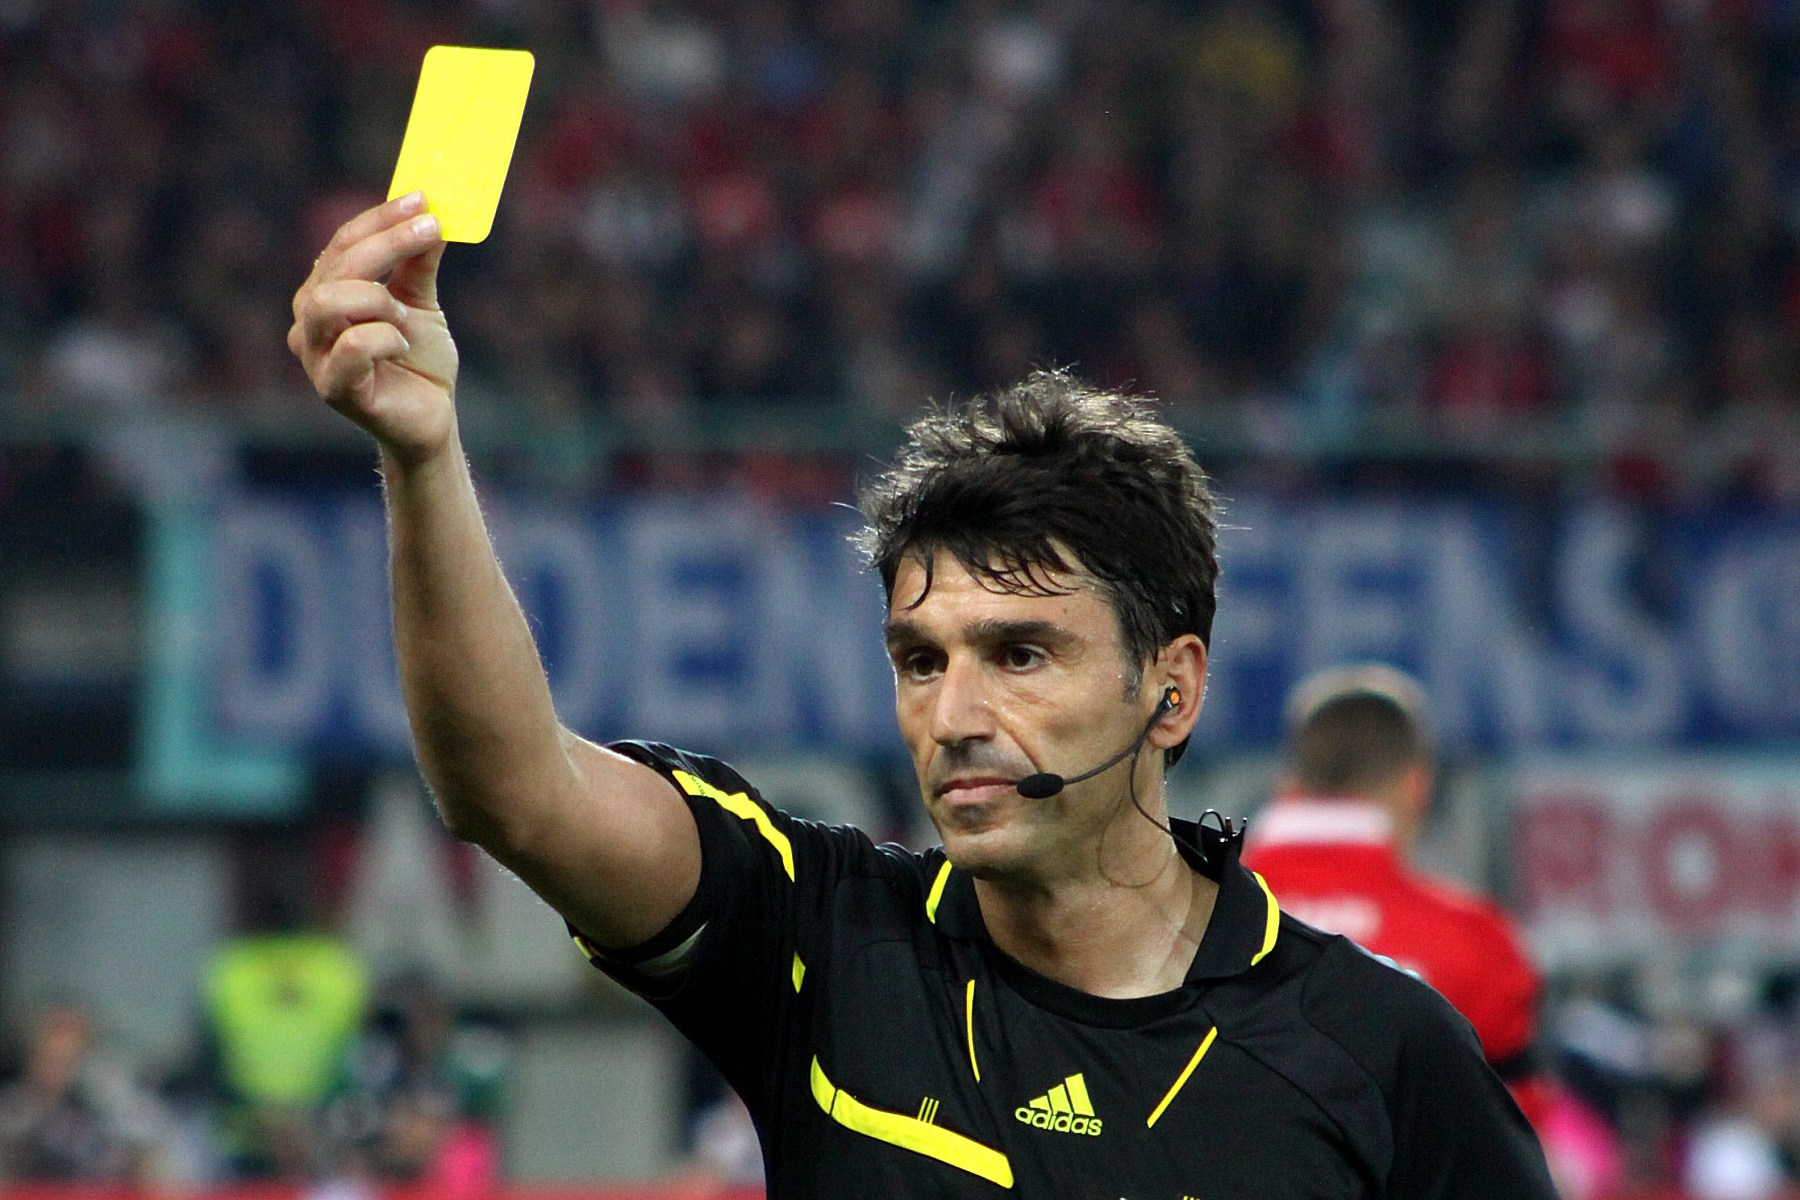 a Soccer/football Referee